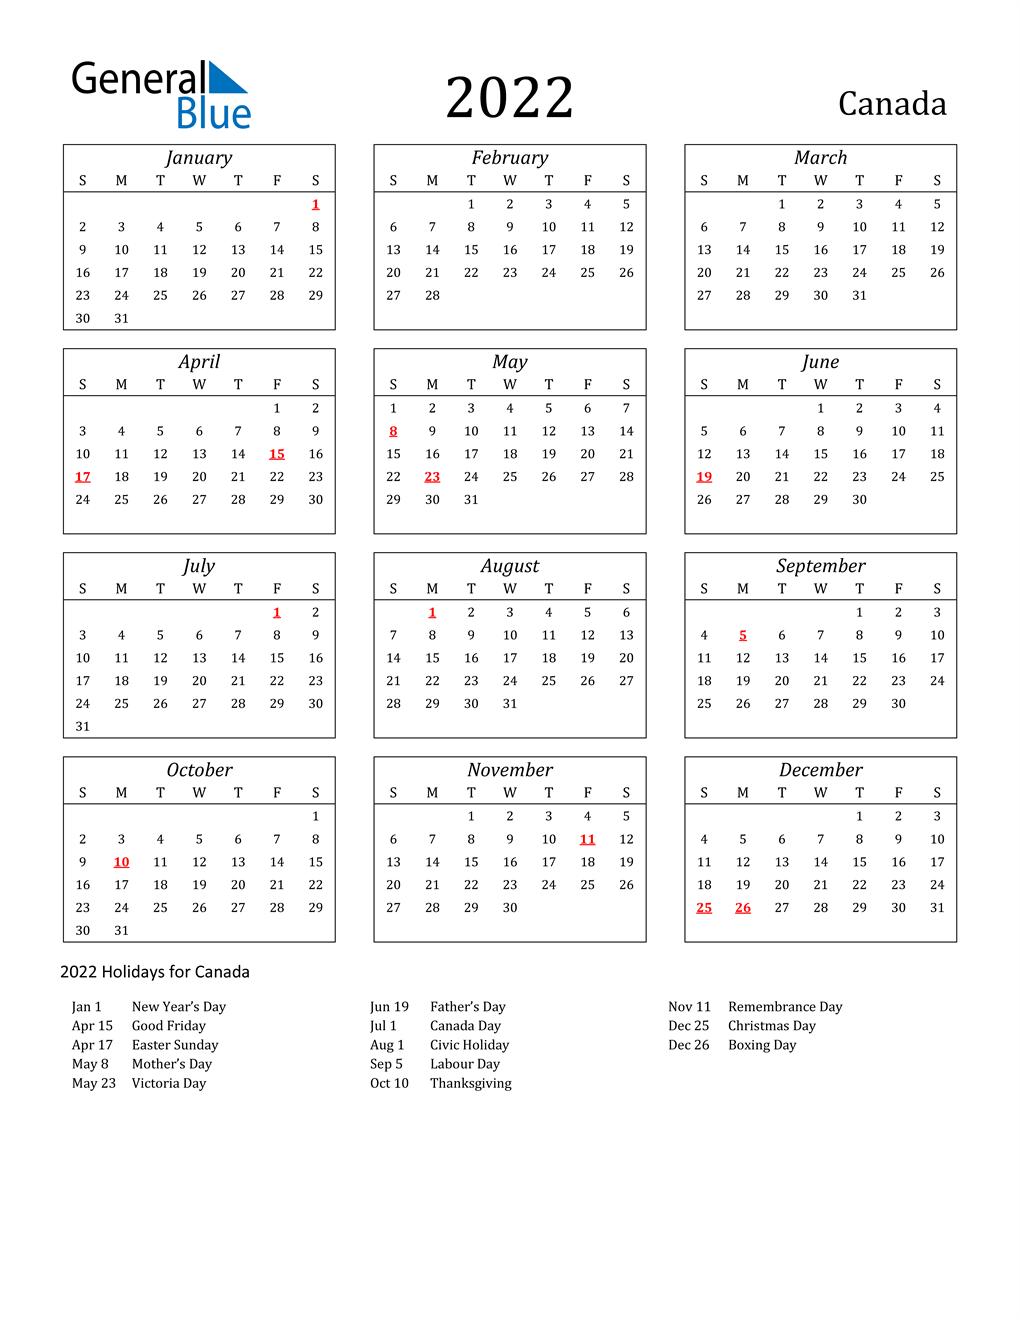 Time And Date Calendar 2022.2022 Canada Calendar With Holidays